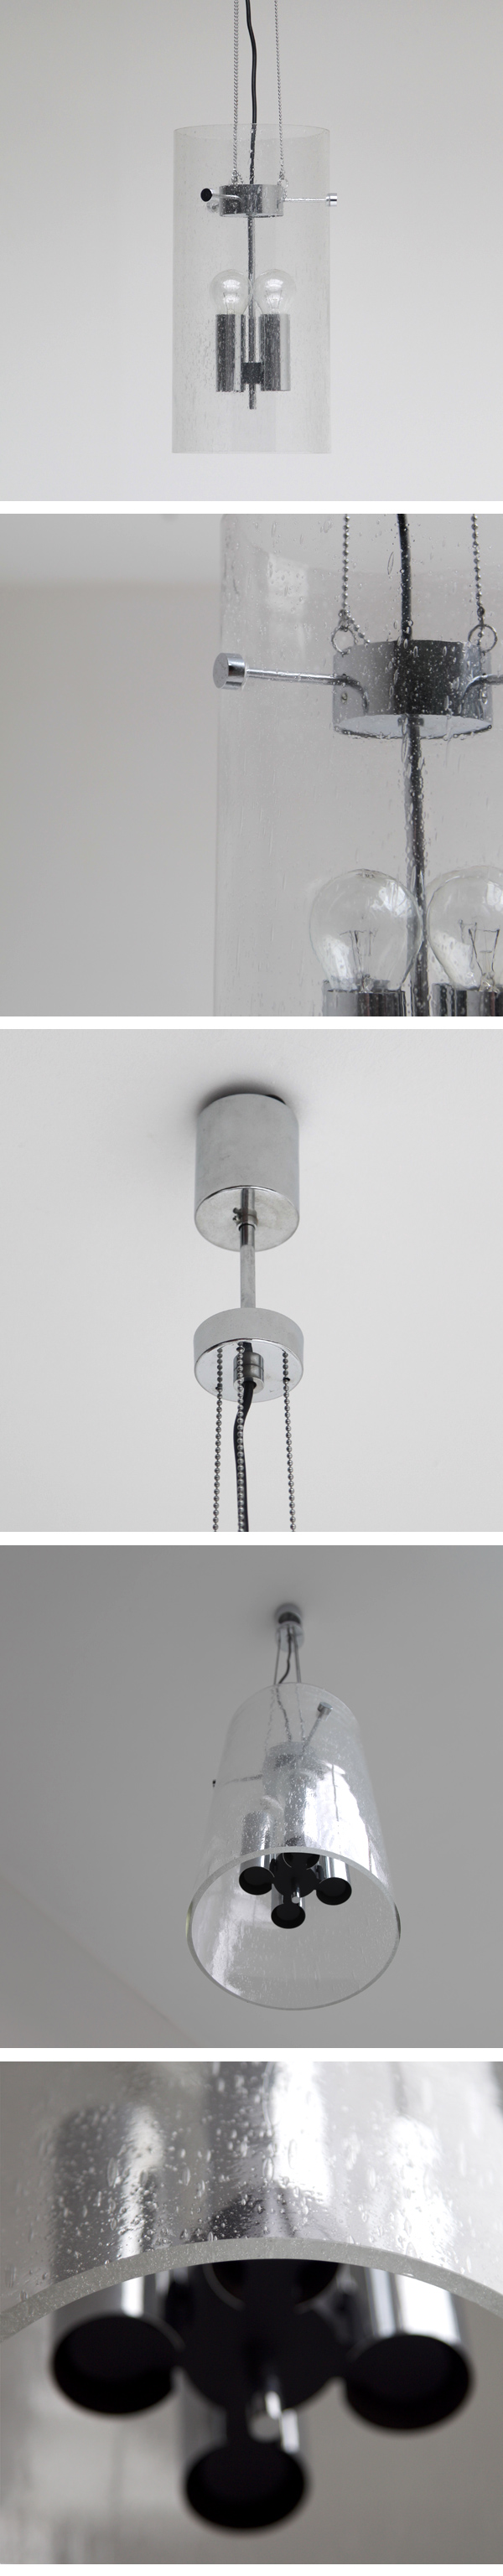 Limburg, Glashütte, hanging, glass, lamp